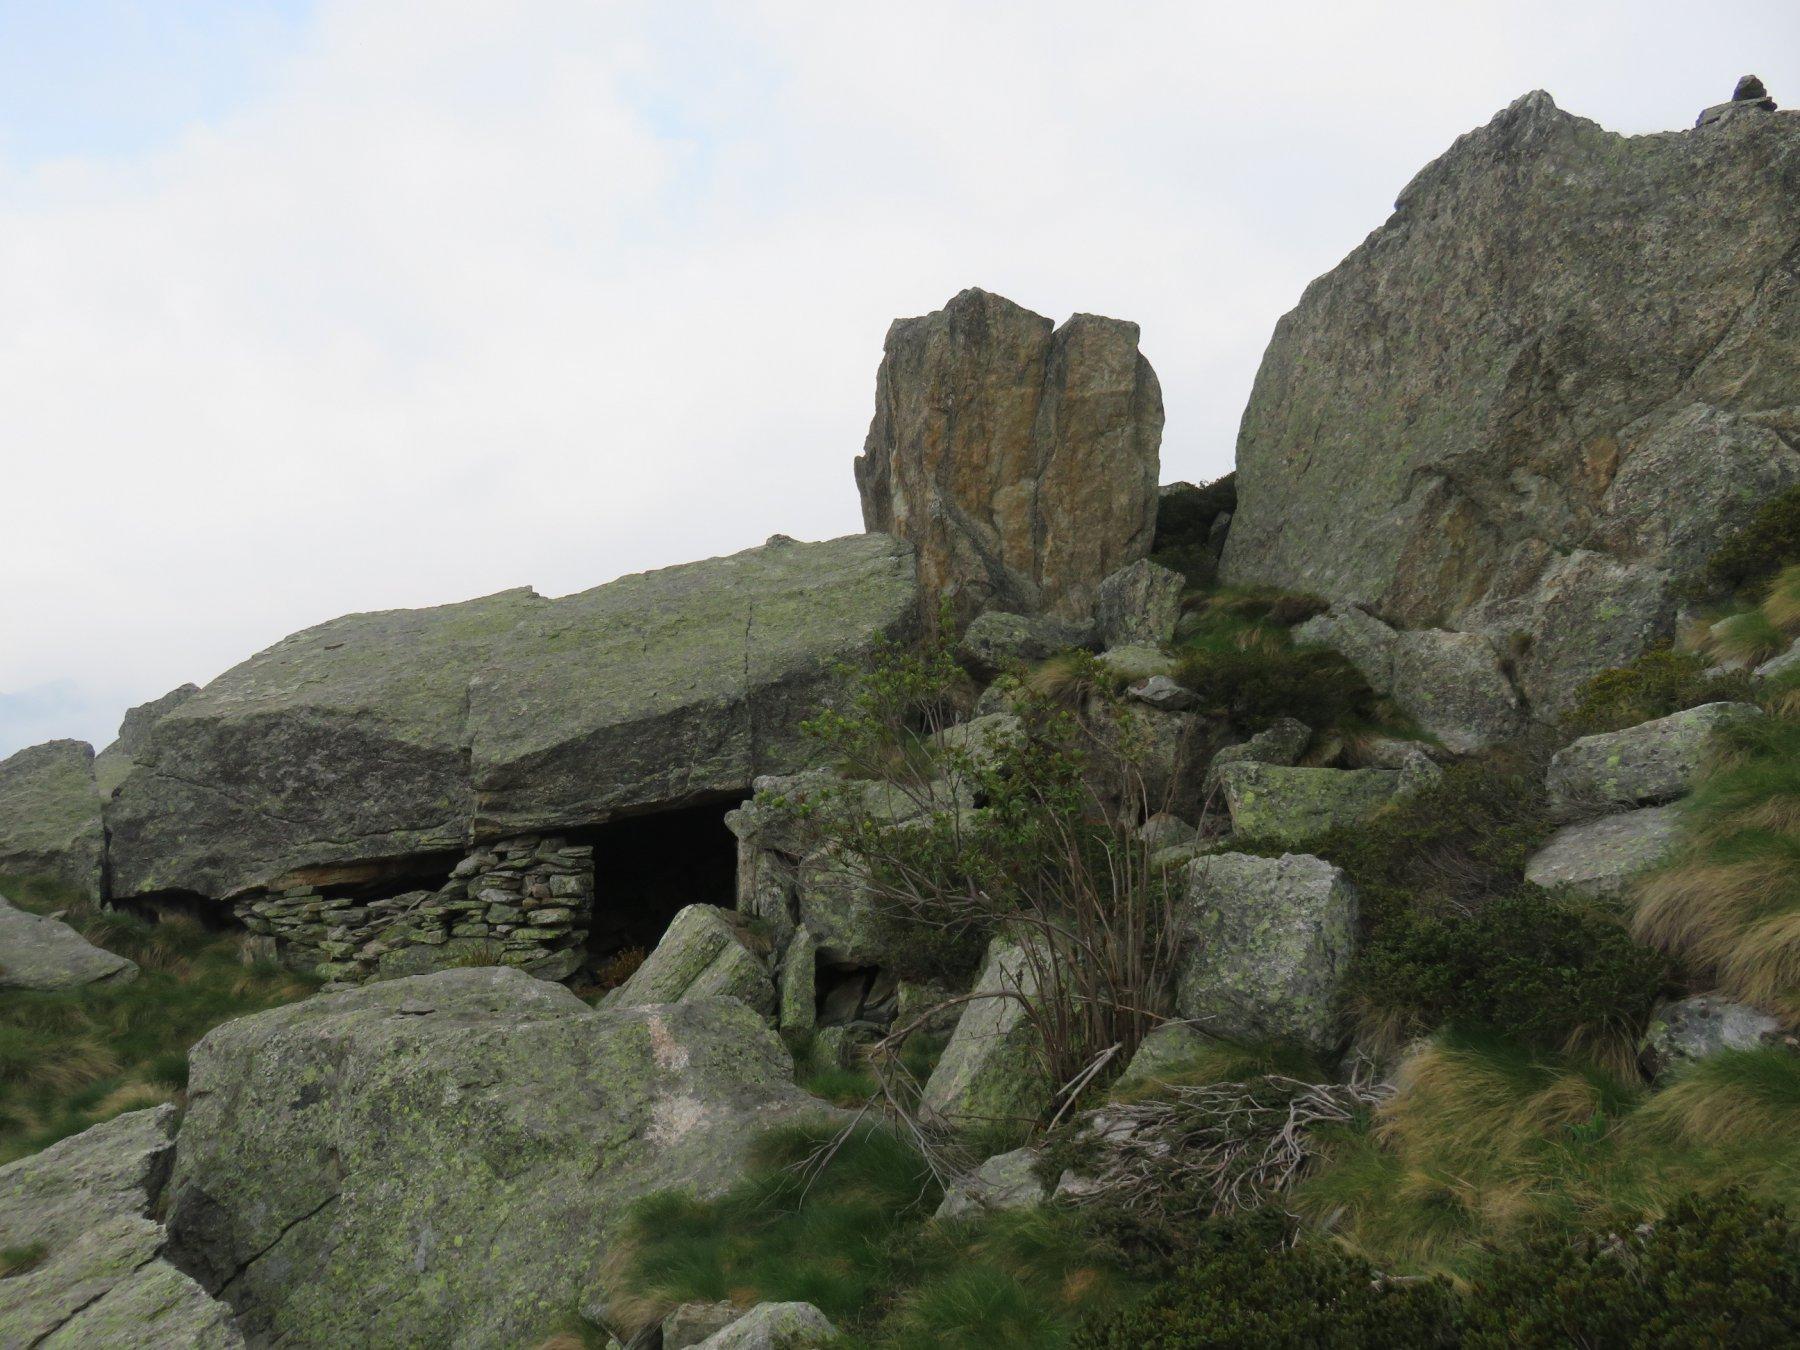 Balma Rocci